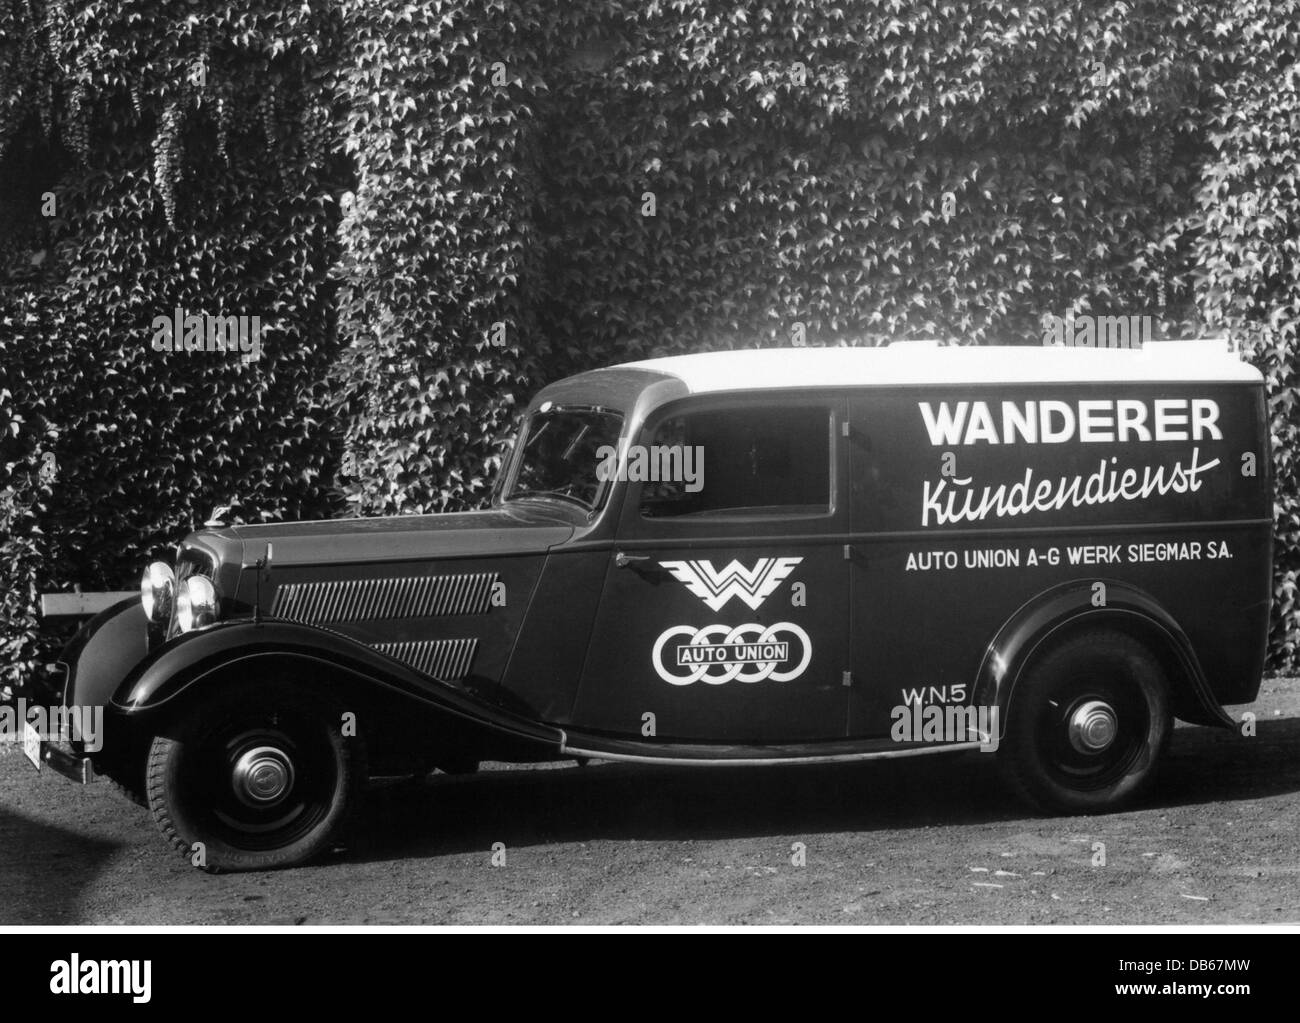 Transporte / Transporte, coches, Wanderer W 22 carro de transporte 1932, W22, caja de vagón, coche, Alemania, Imagen De Stock